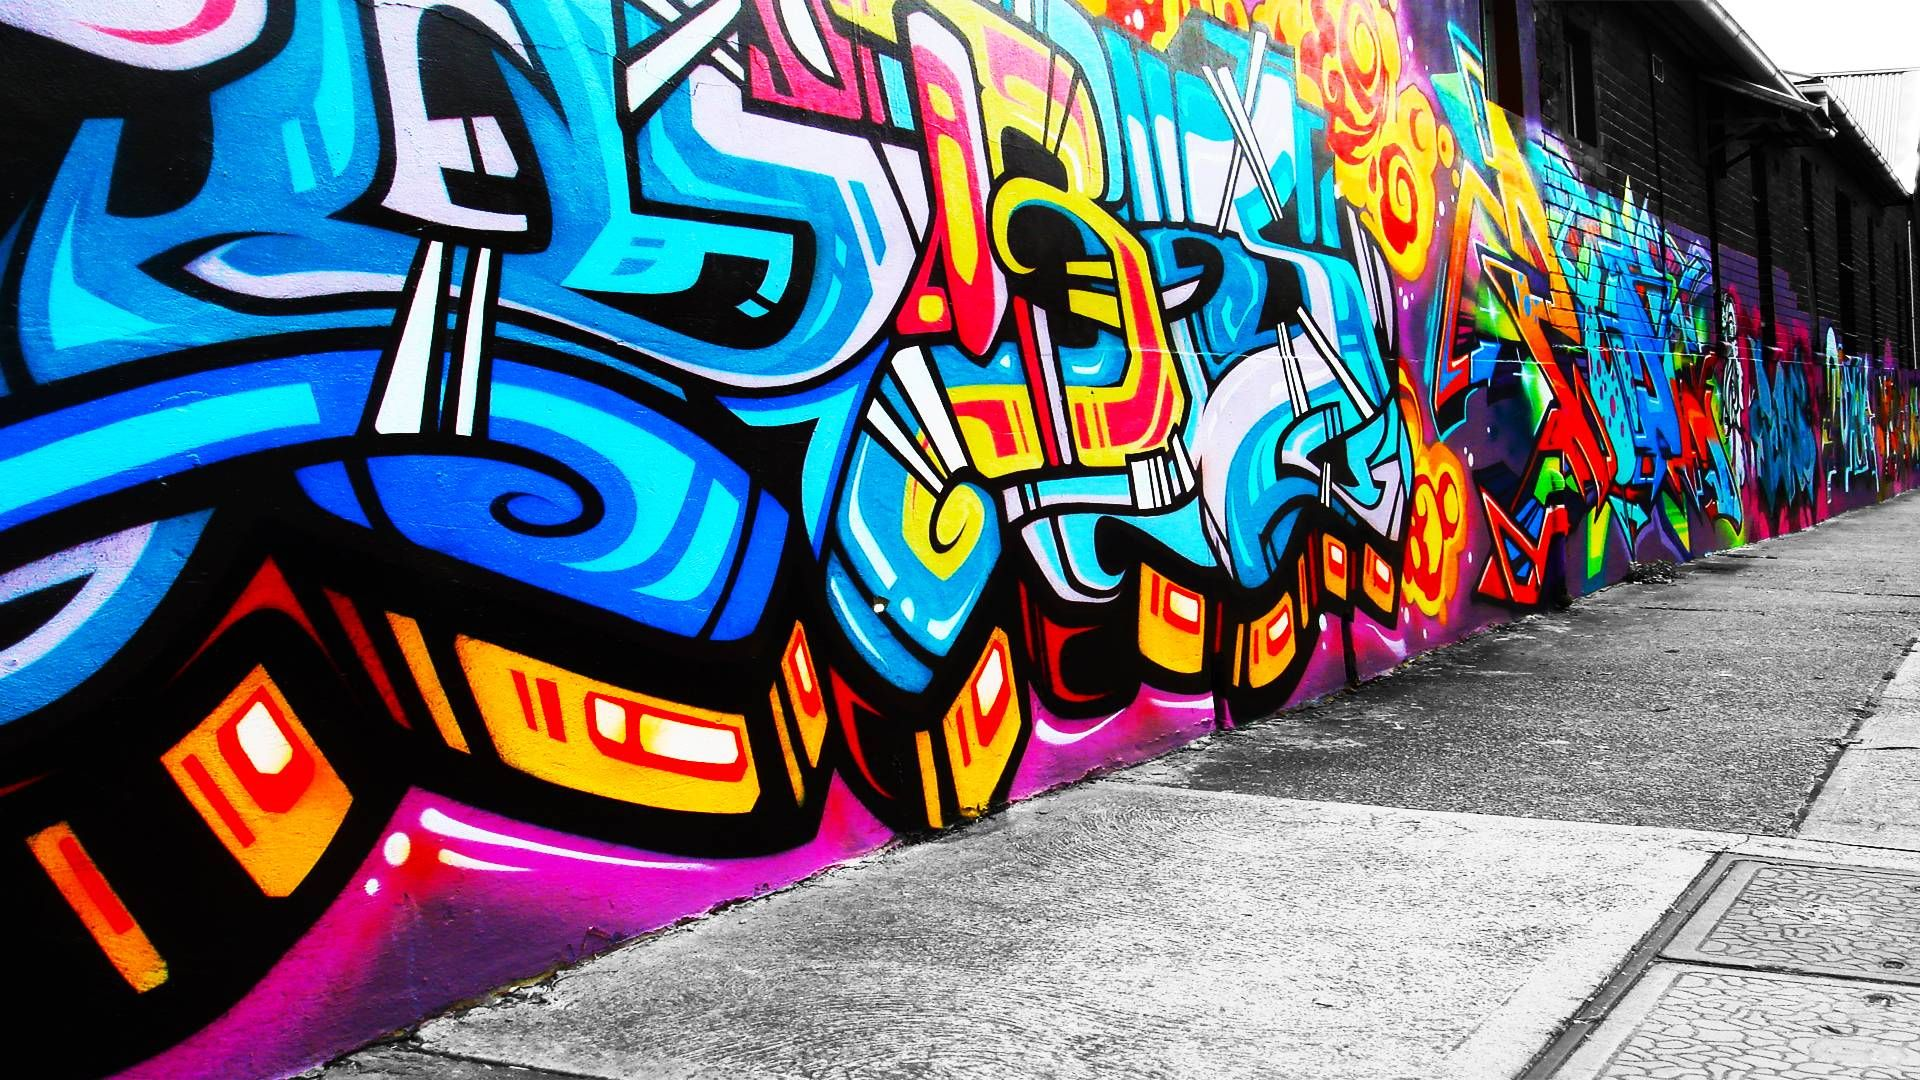 Graffiti art wallpaper for walls - Hd Graffiti Wallpapers Wallpaper Graffiti Wall Artgraffiti